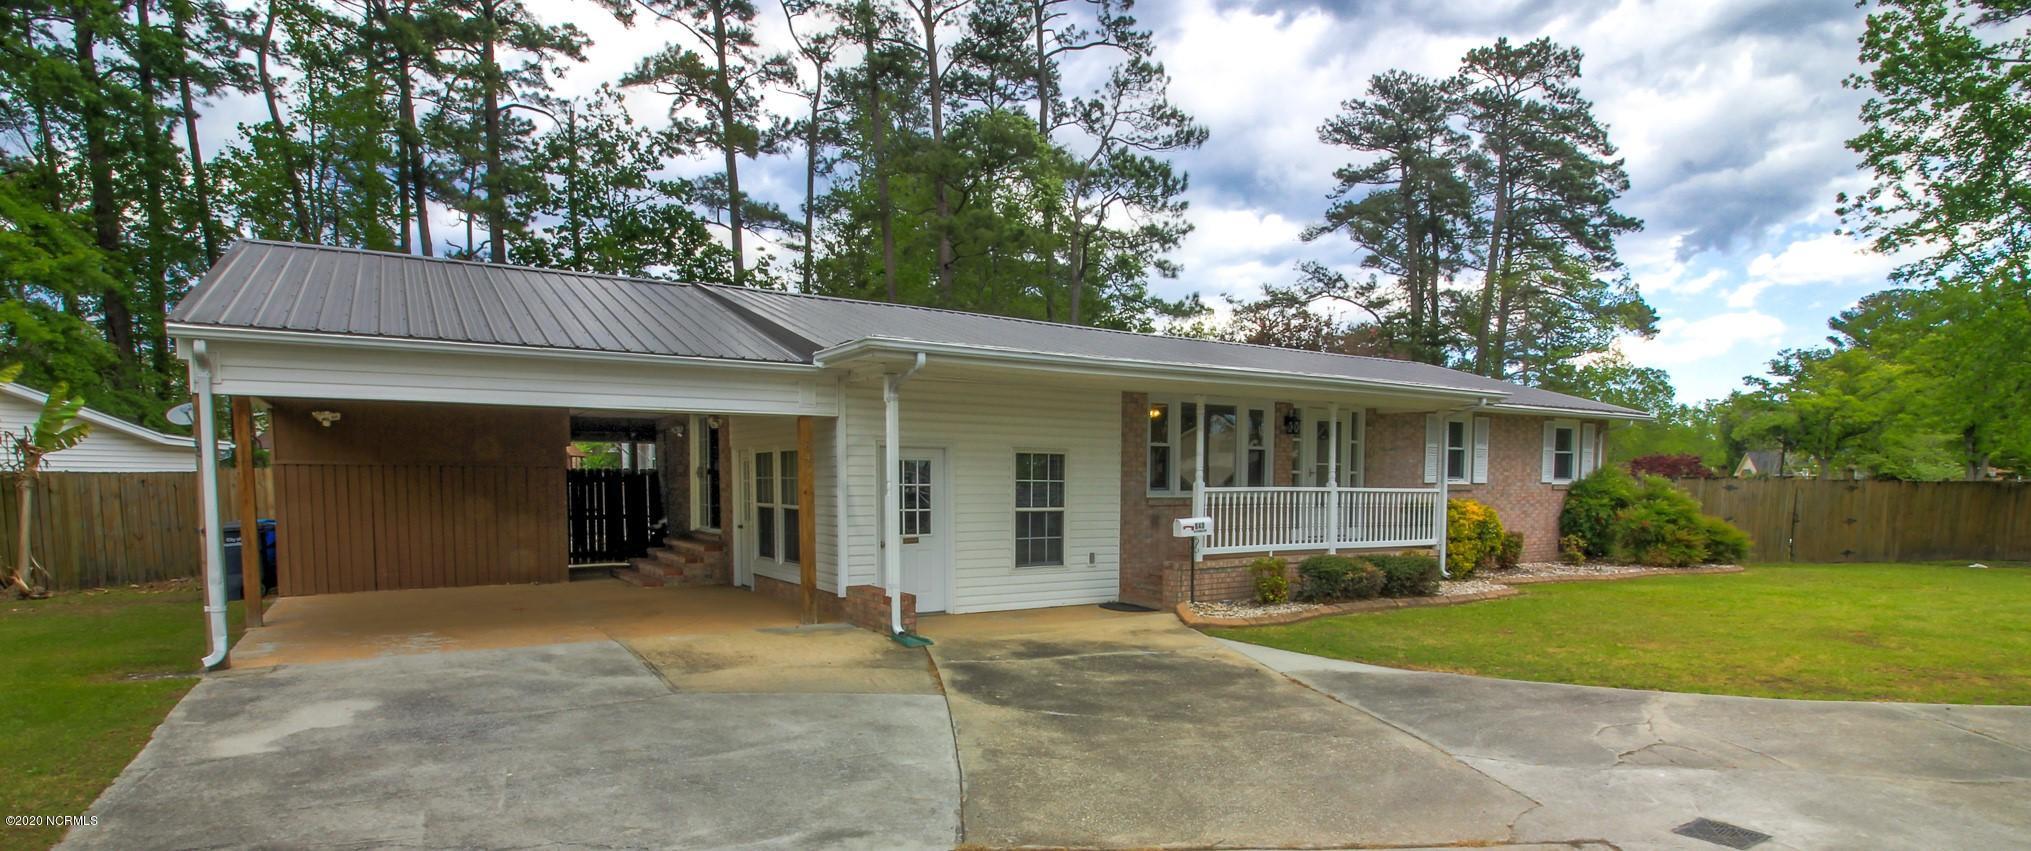 840 Gum Branch Road, Jacksonville, North Carolina 28540, 3 Bedrooms Bedrooms, ,2 BathroomsBathrooms,Residential,For Sale,Gum Branch,100214769